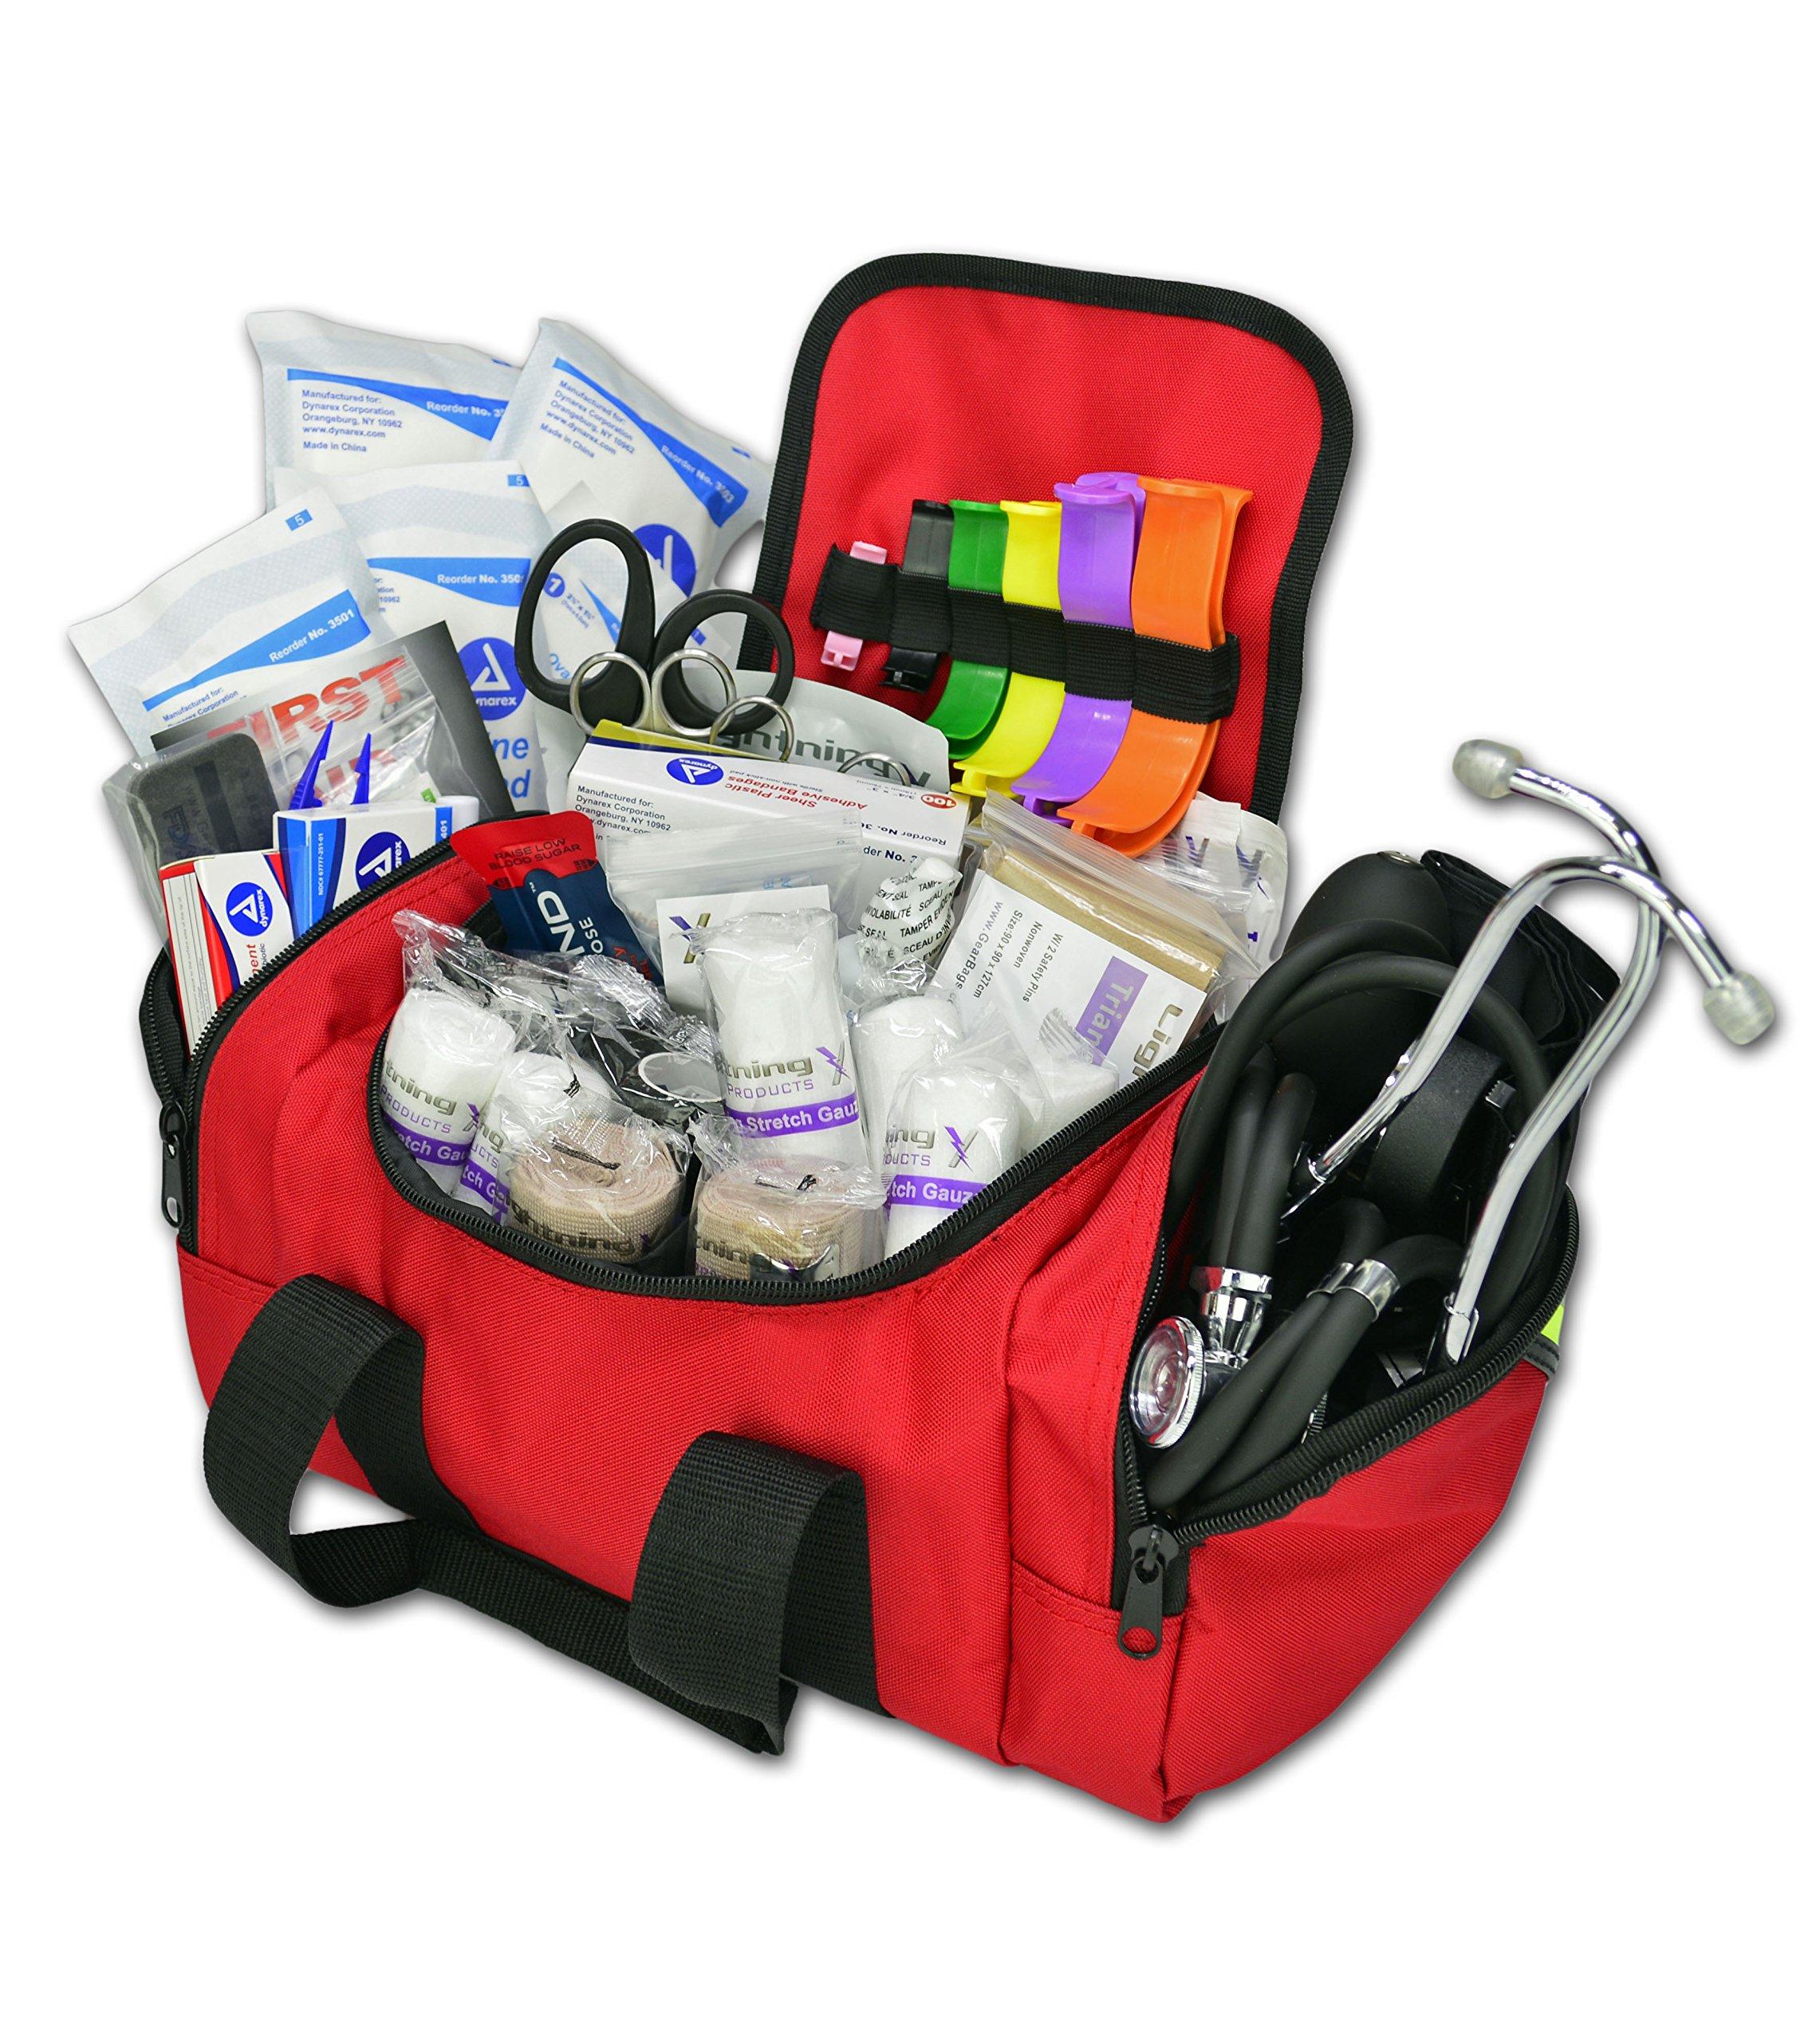 Lightning X Value Compact Medic First Responder EMS/EMT Stocked Trauma Bag w/Standard Fill Kit B - RED